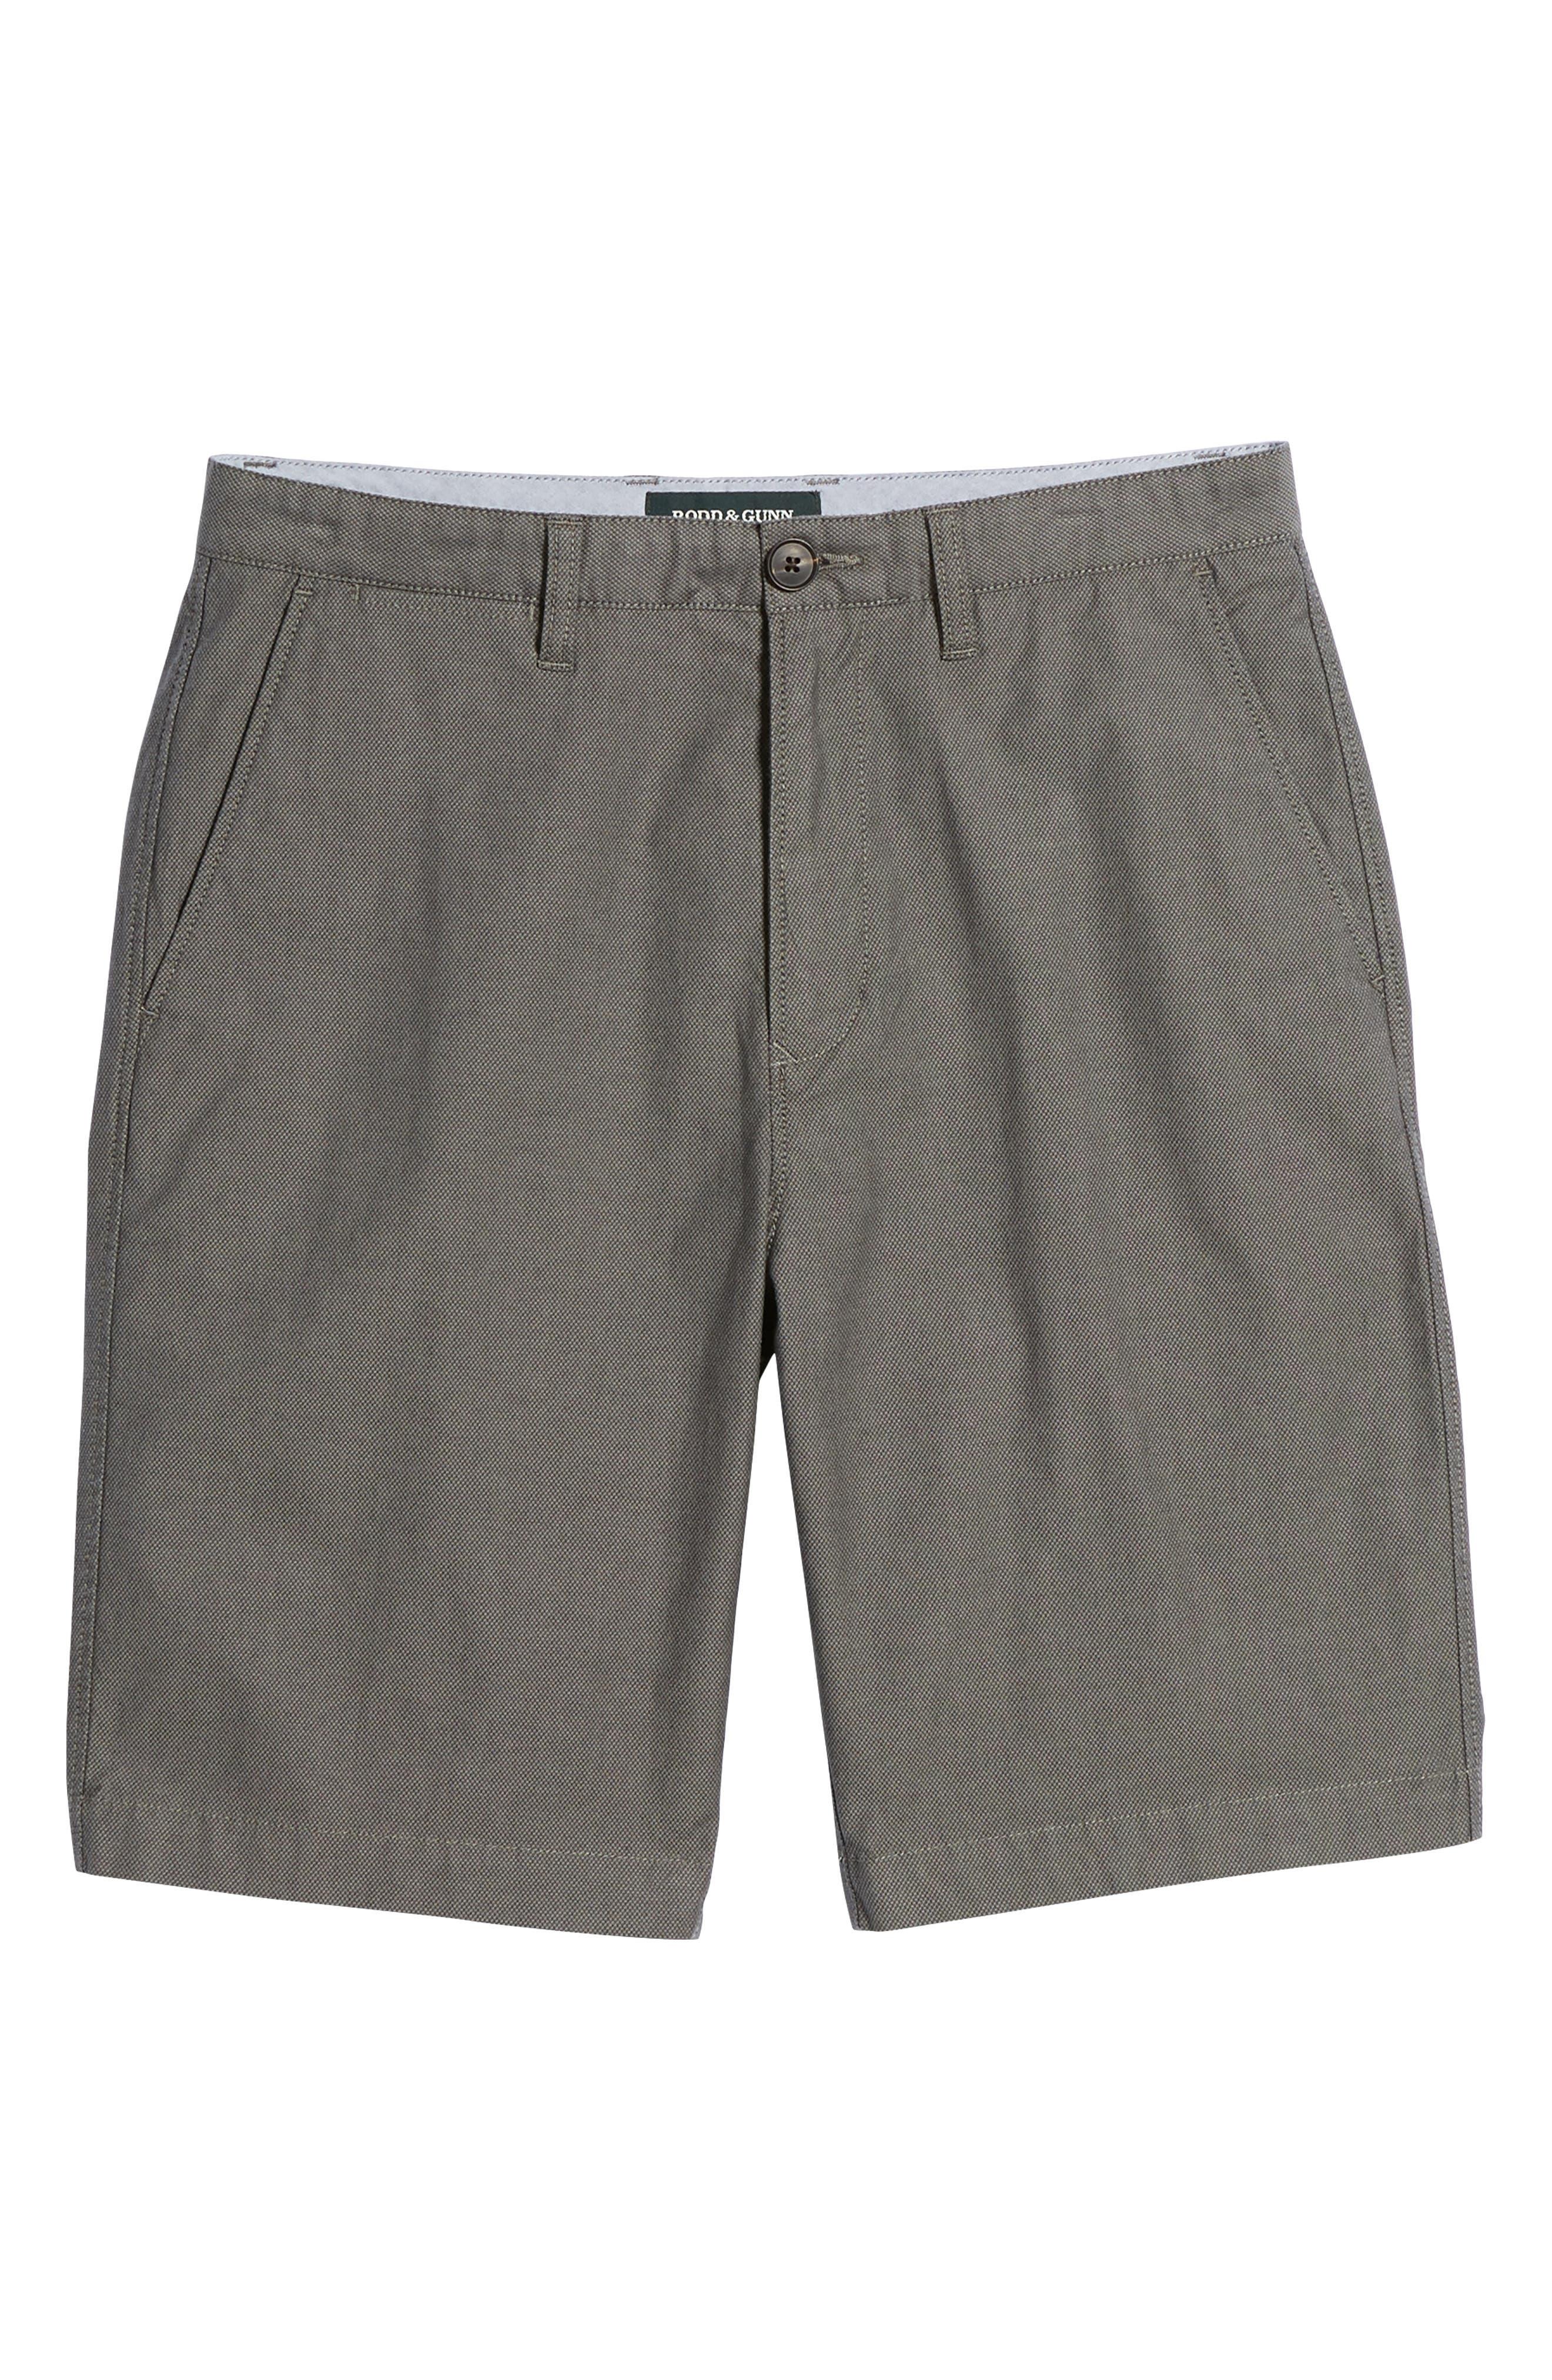 Army Bay Regular Fit Shorts,                             Alternate thumbnail 6, color,                             Granite